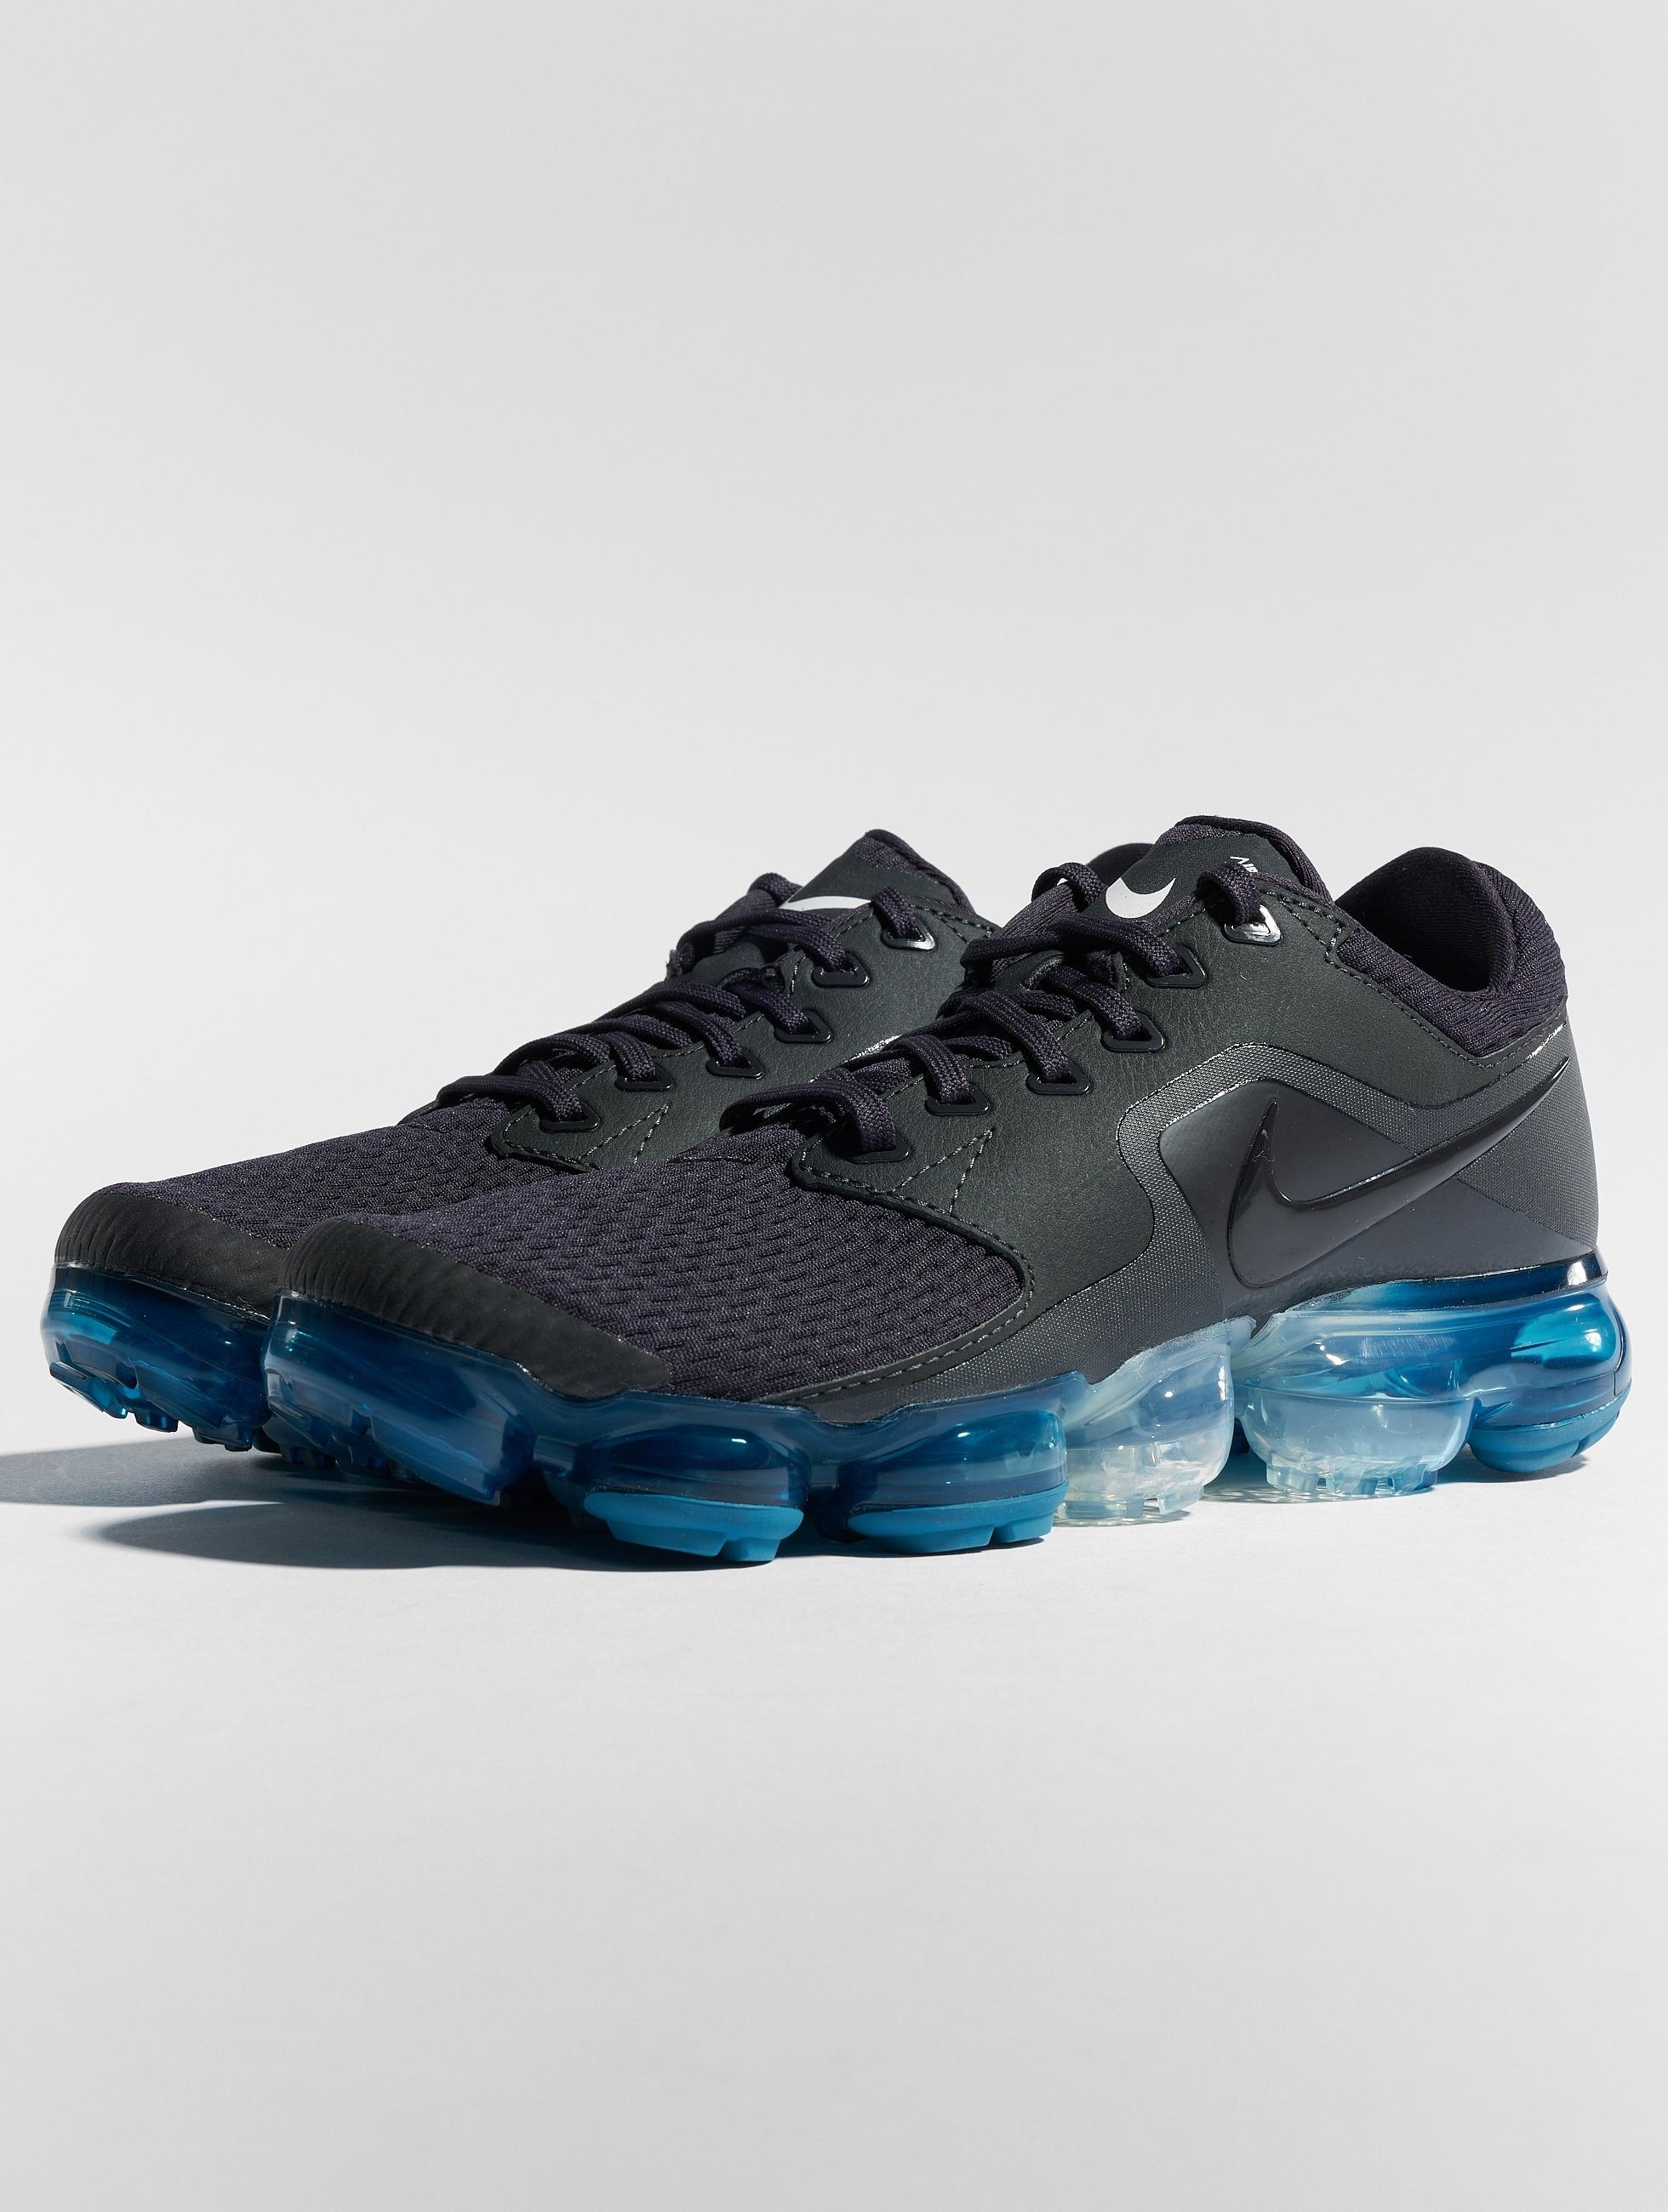 3481ced05f115e Nike schoen / sneaker Air Vapormax GS in blauw 573059